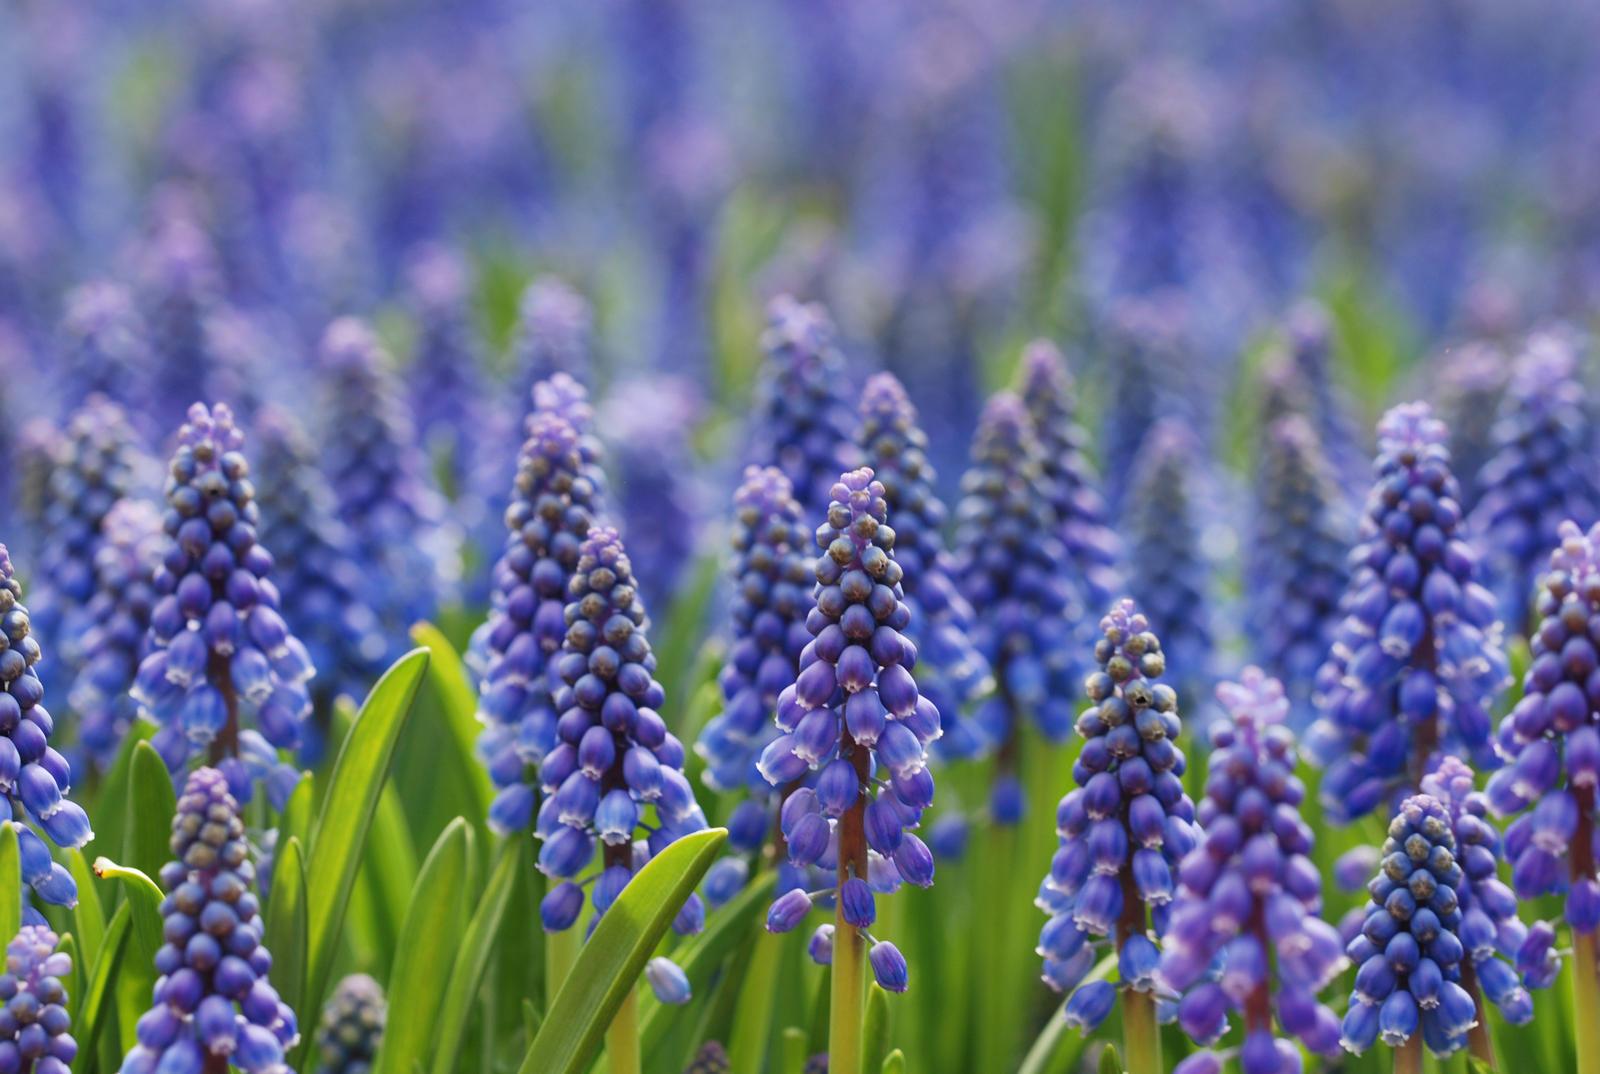 Grape Hyacinth by MatthewLCH